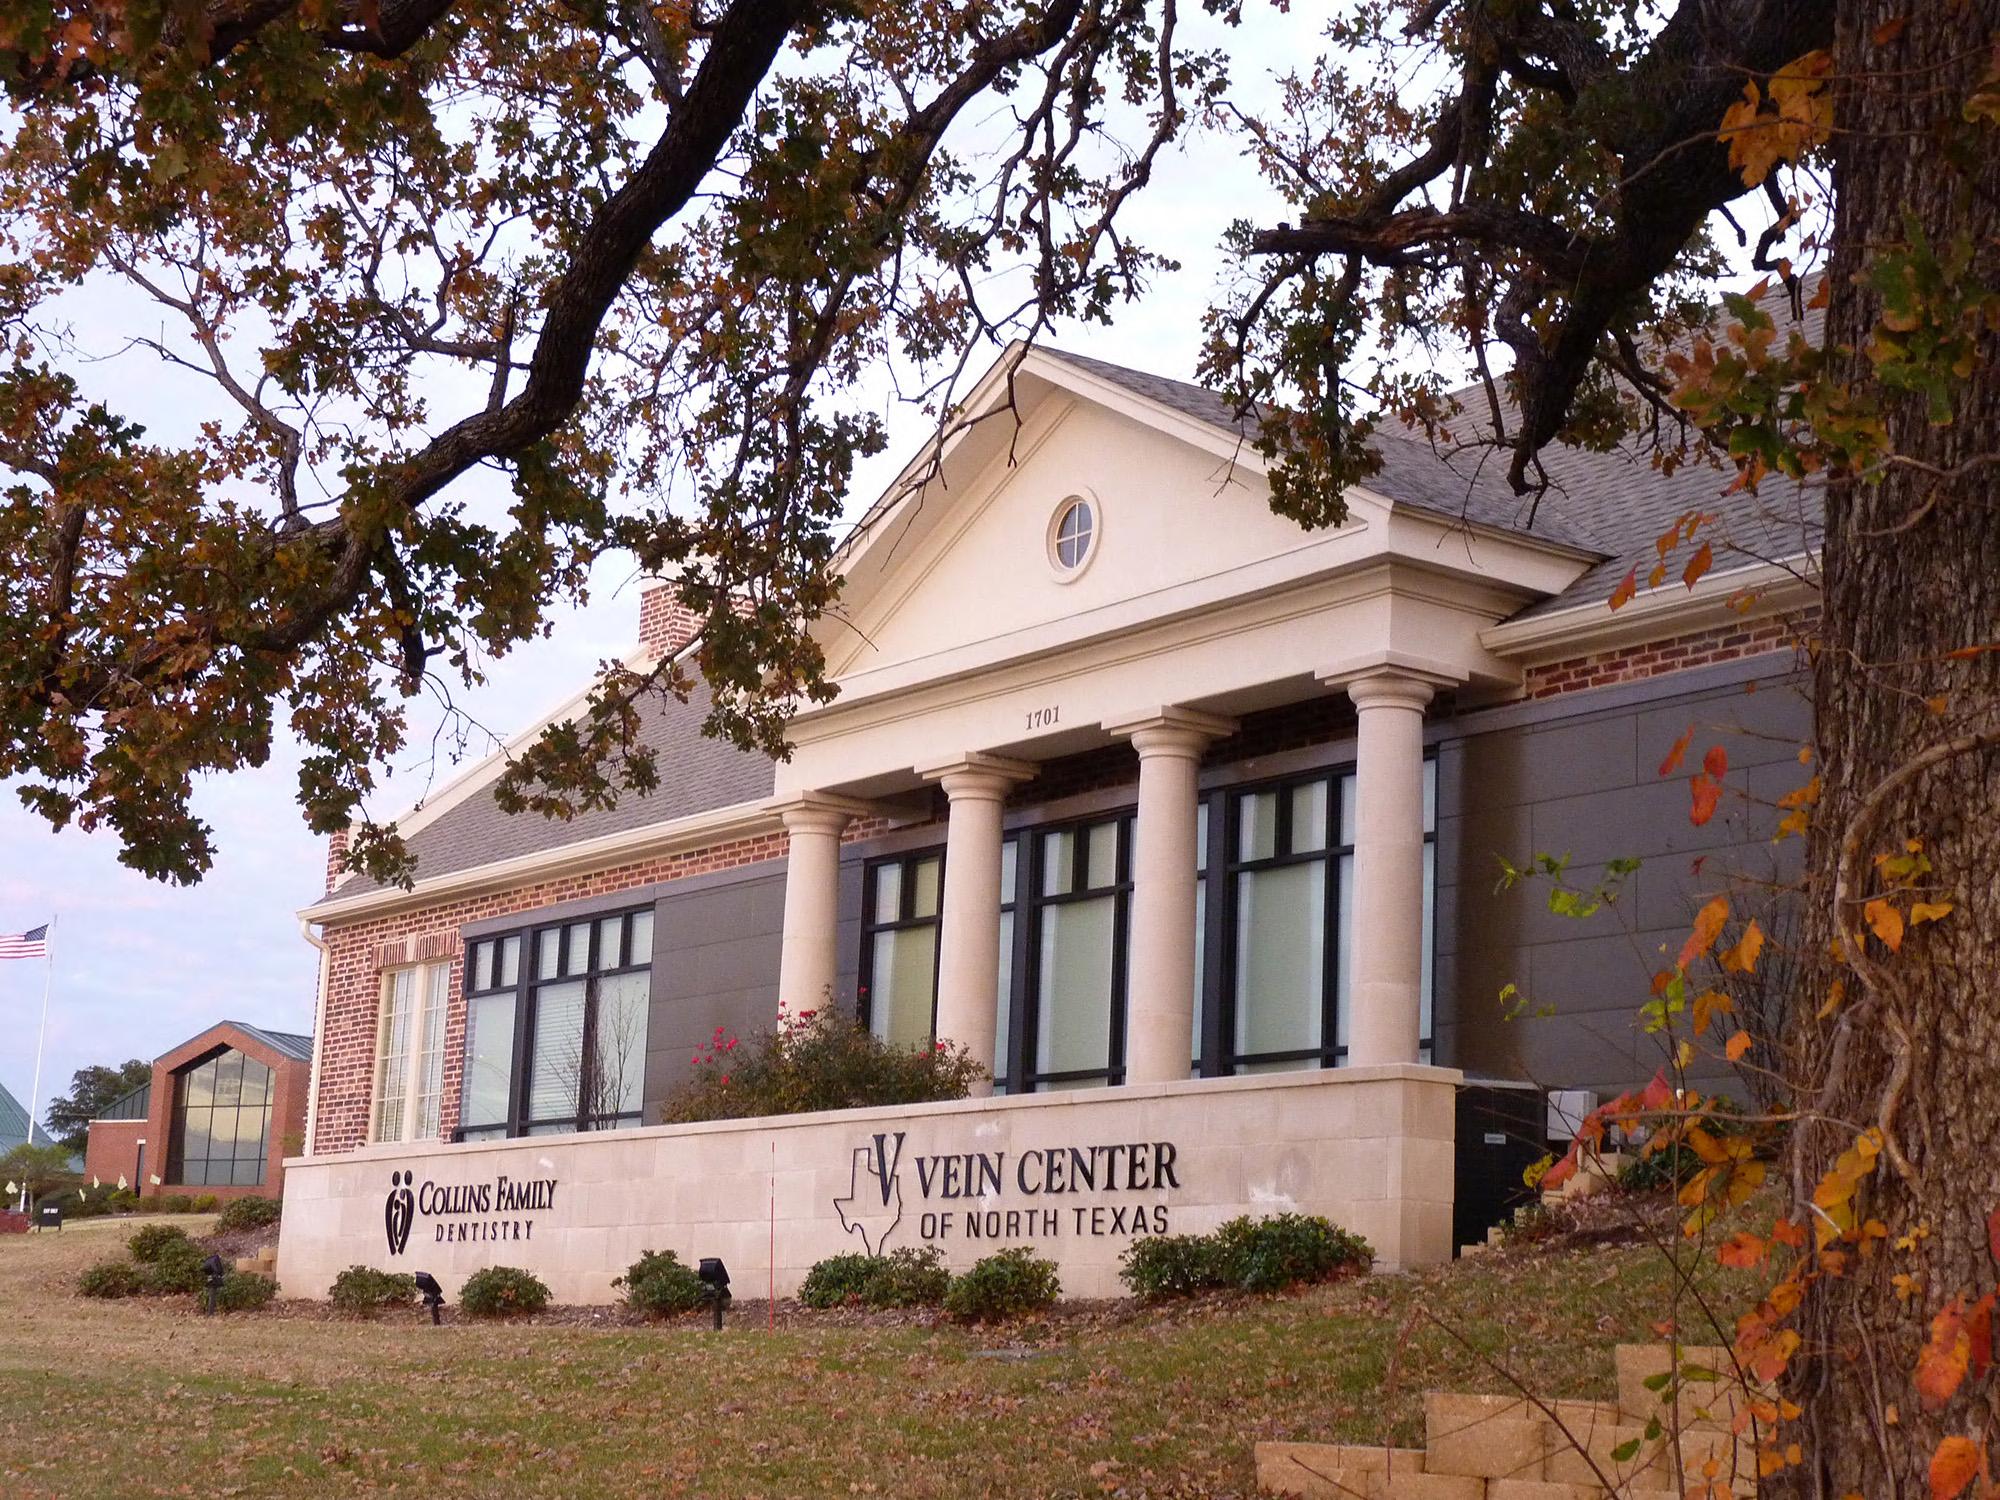 Vein Center of North Texas